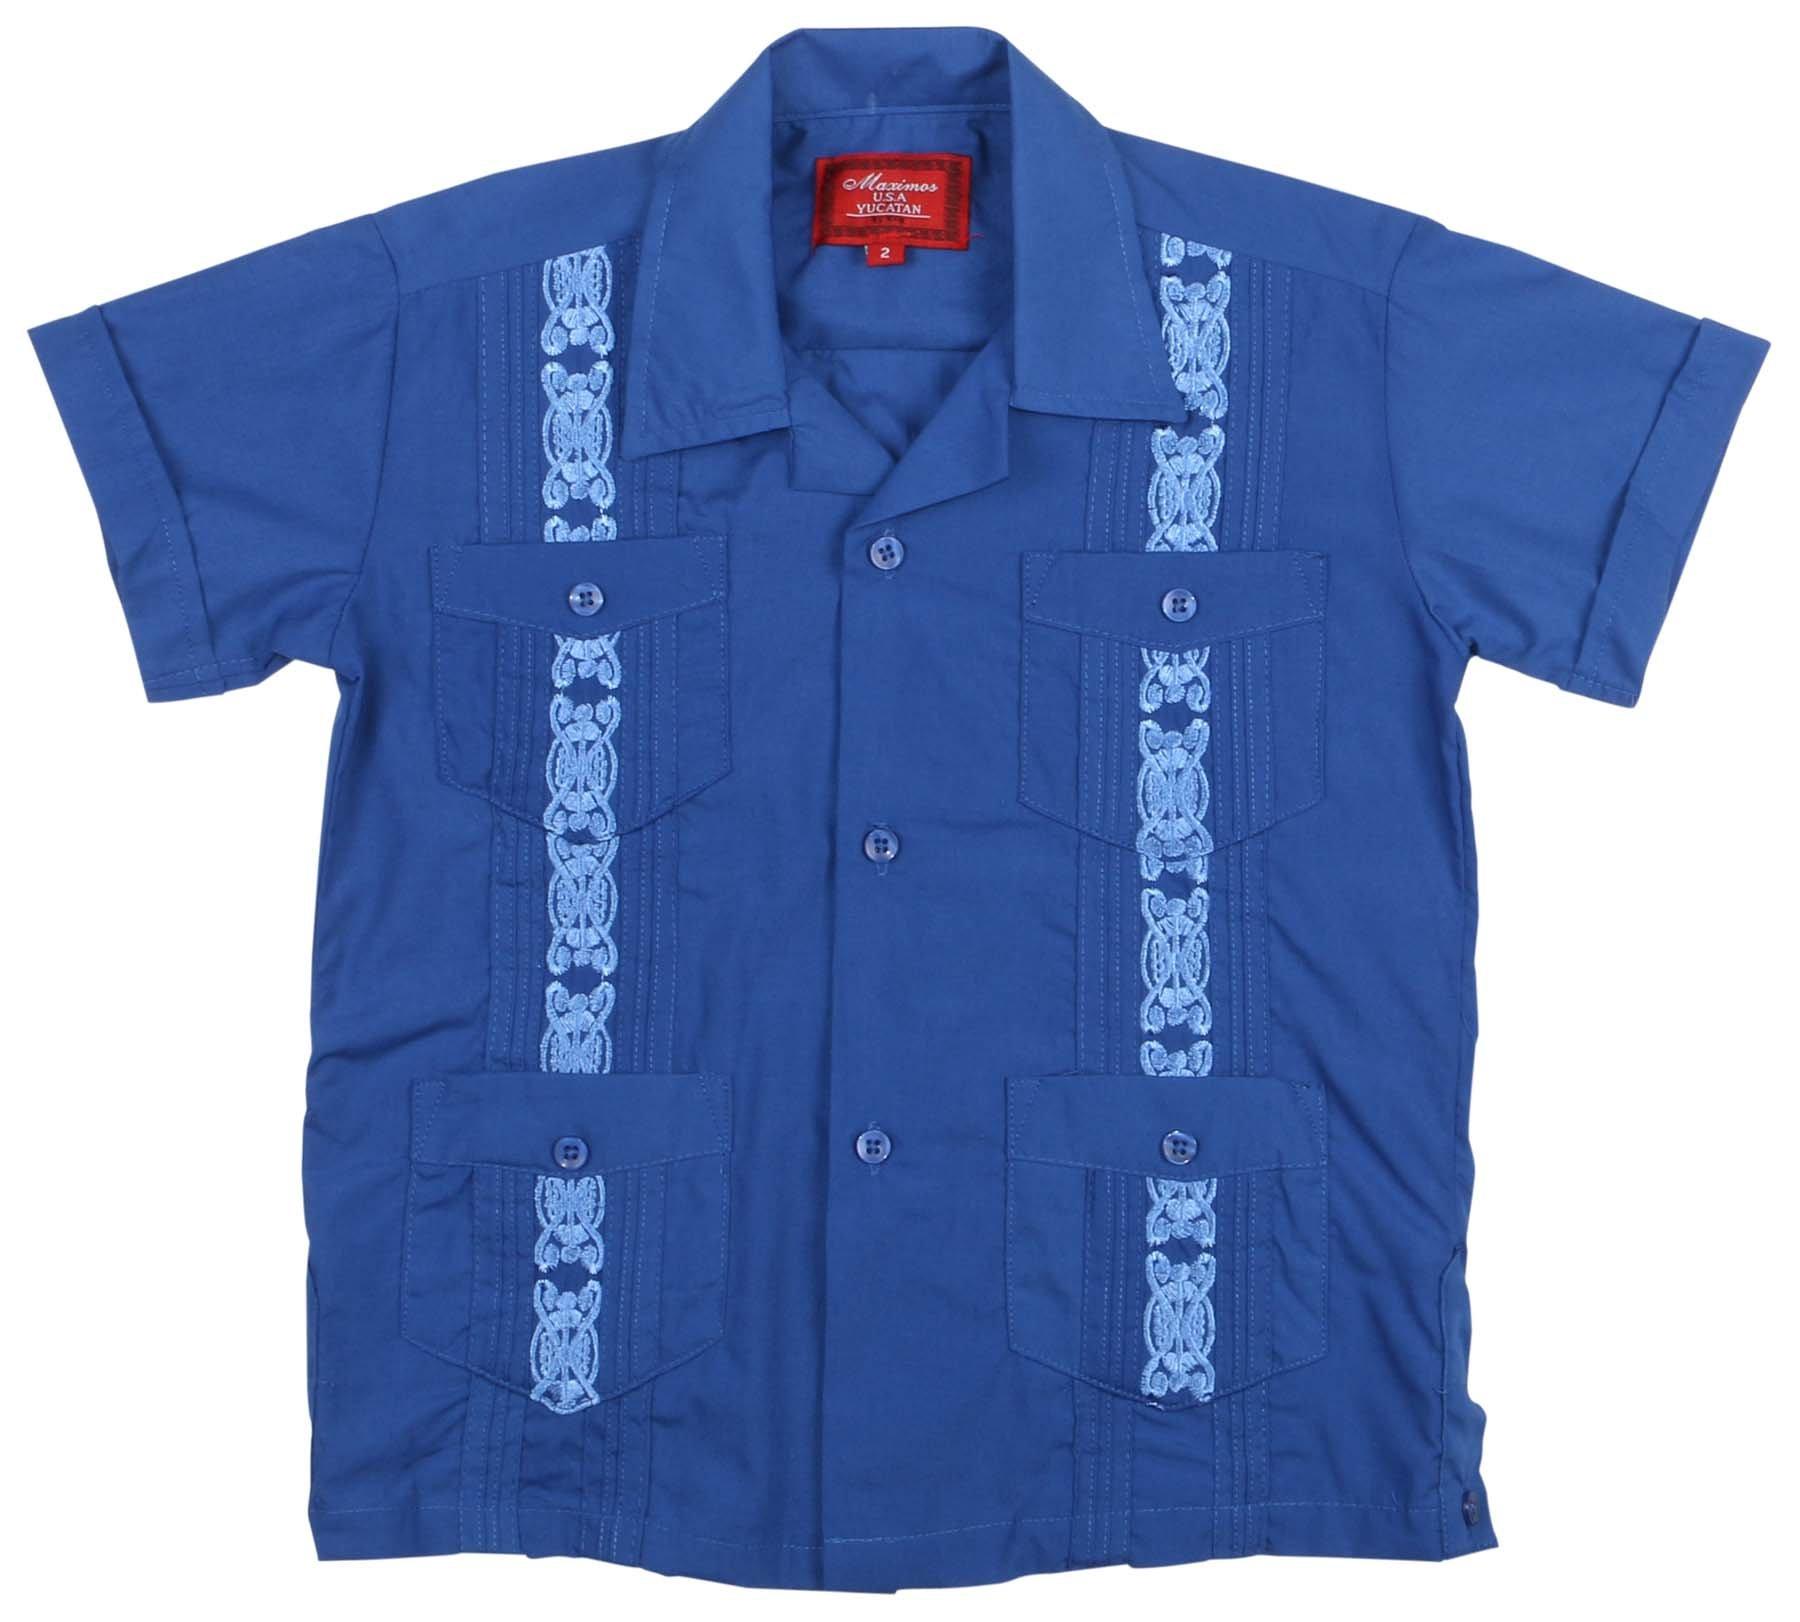 9 Crowns Essentials Boys' Guayabera Button Down Shirt-Royal Blue-18